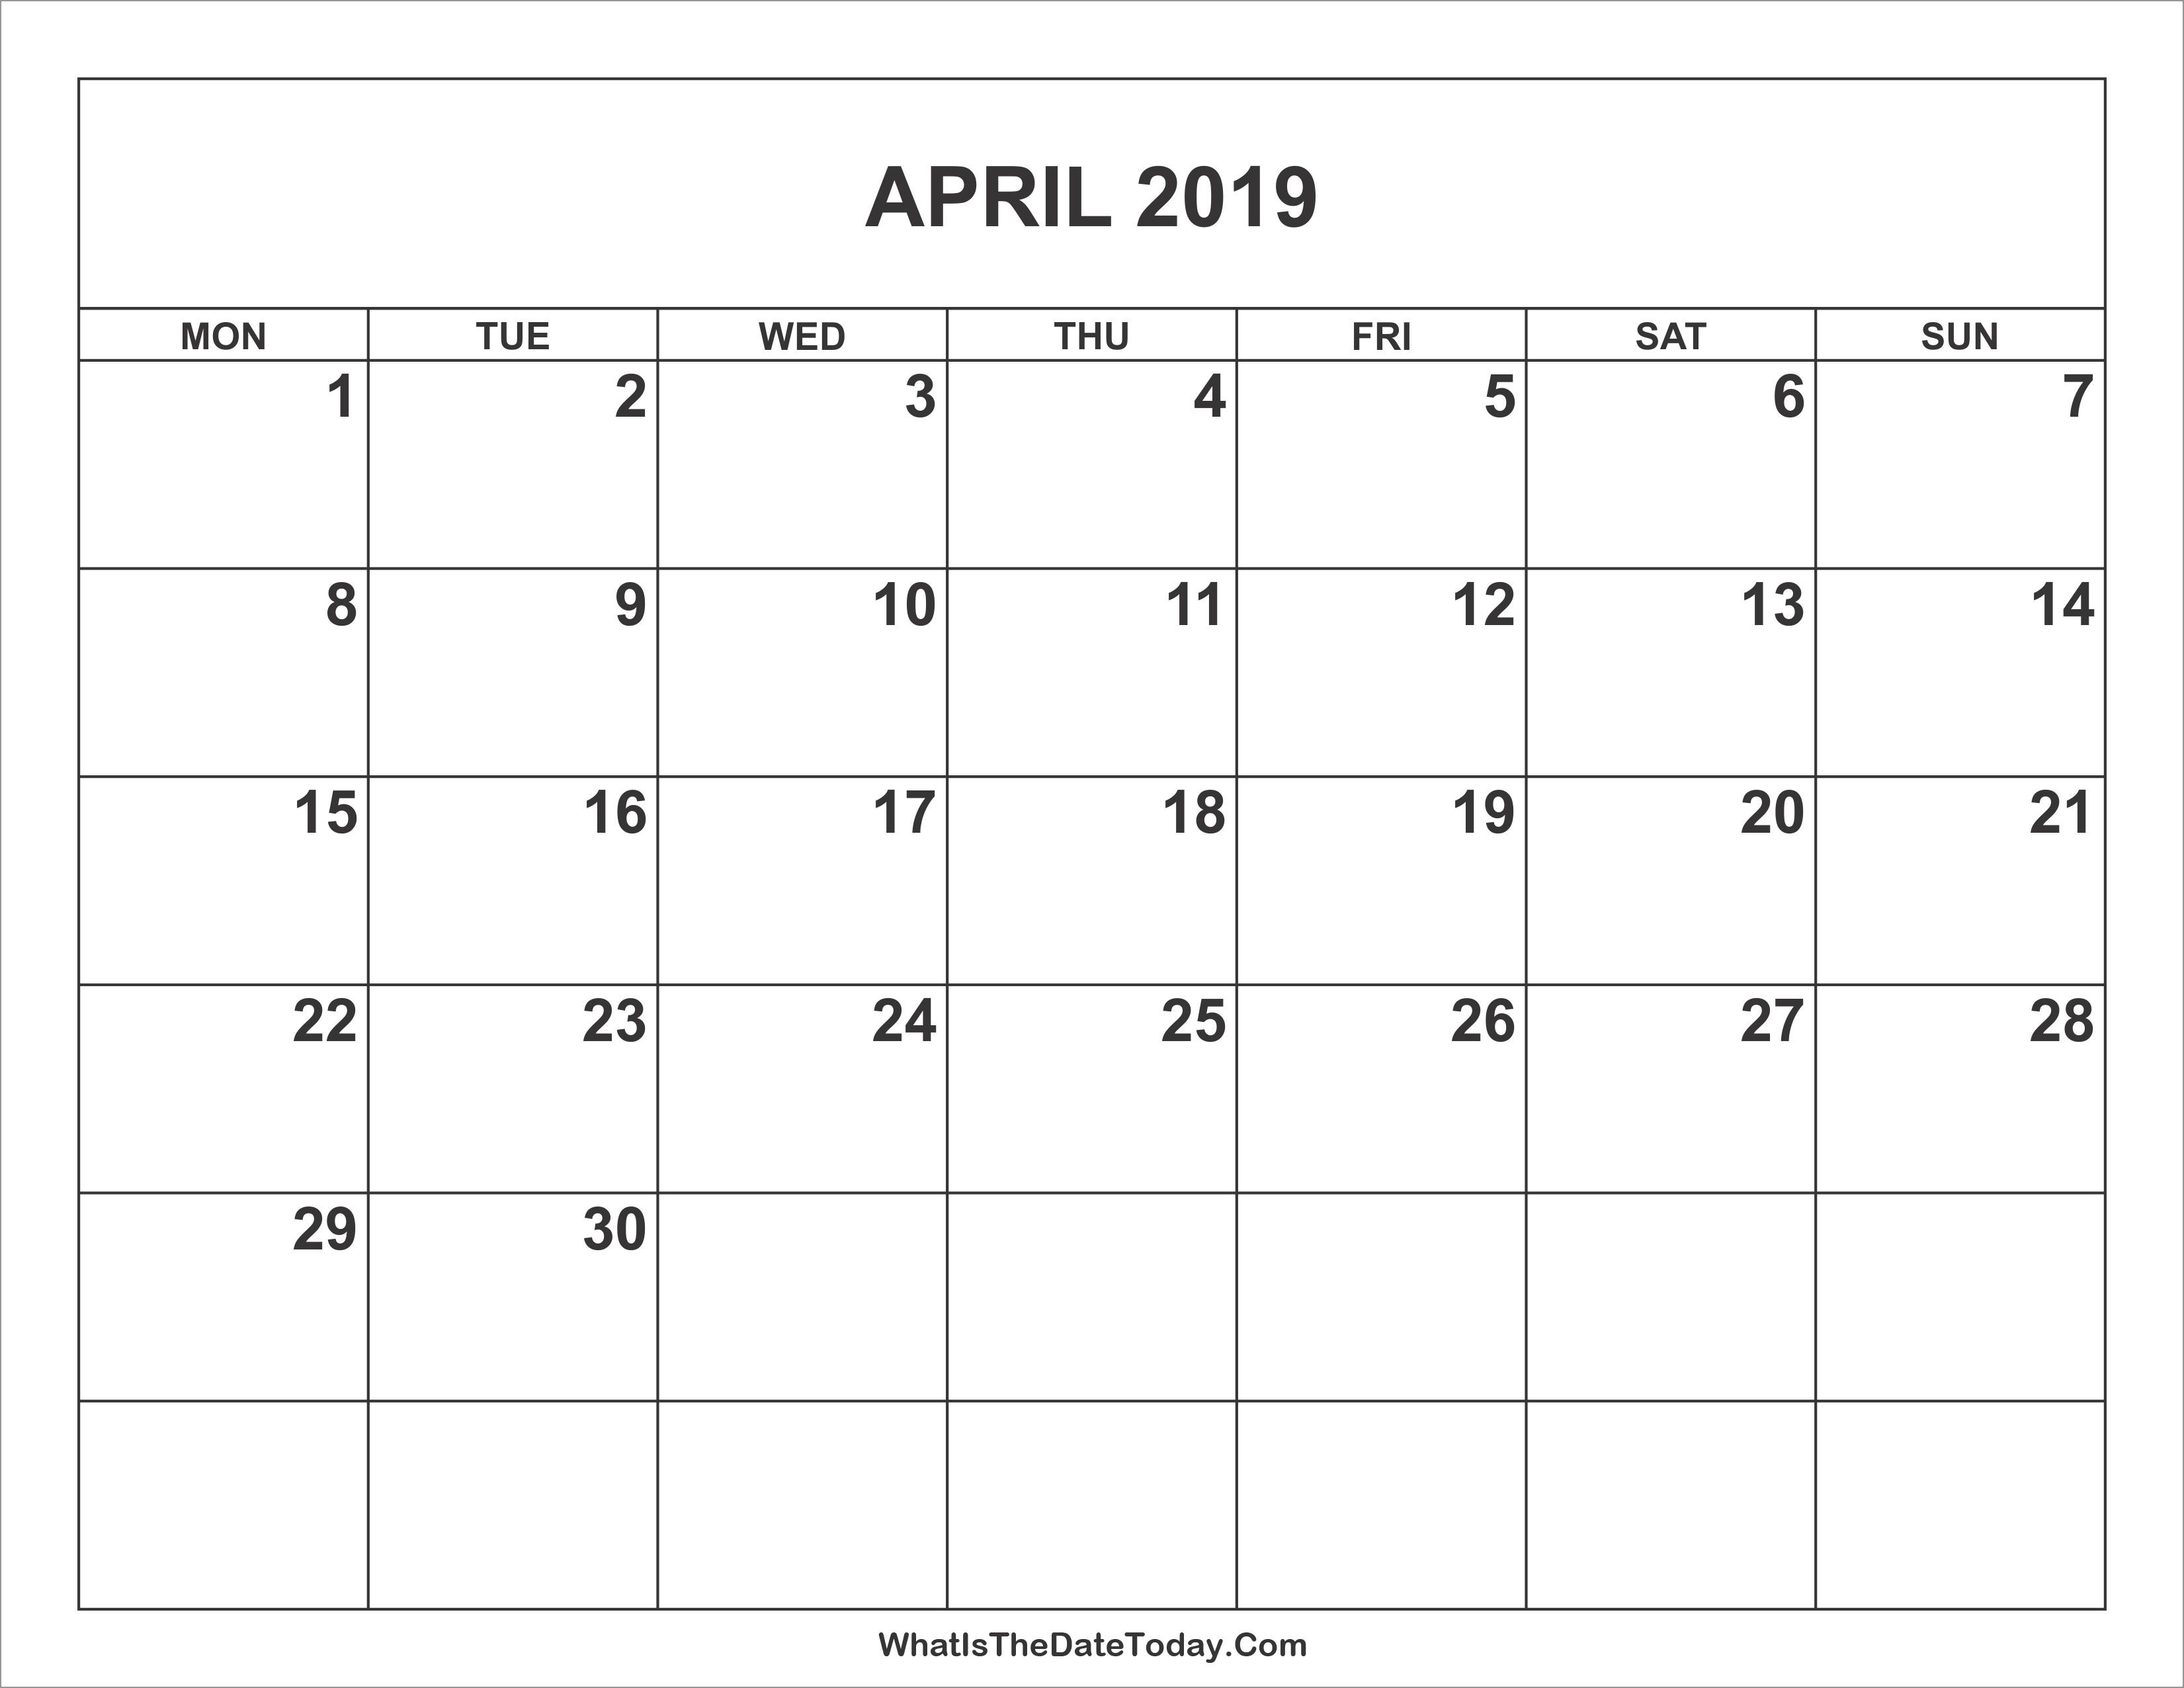 March Calendar Canada Más Recientes April 2019 Calendar Word April 2019 Calendar Of March Calendar Canada Más Arriba-a-fecha Kalender Ausdrucken 2015 Schön Printable 0d Calendars Kalender